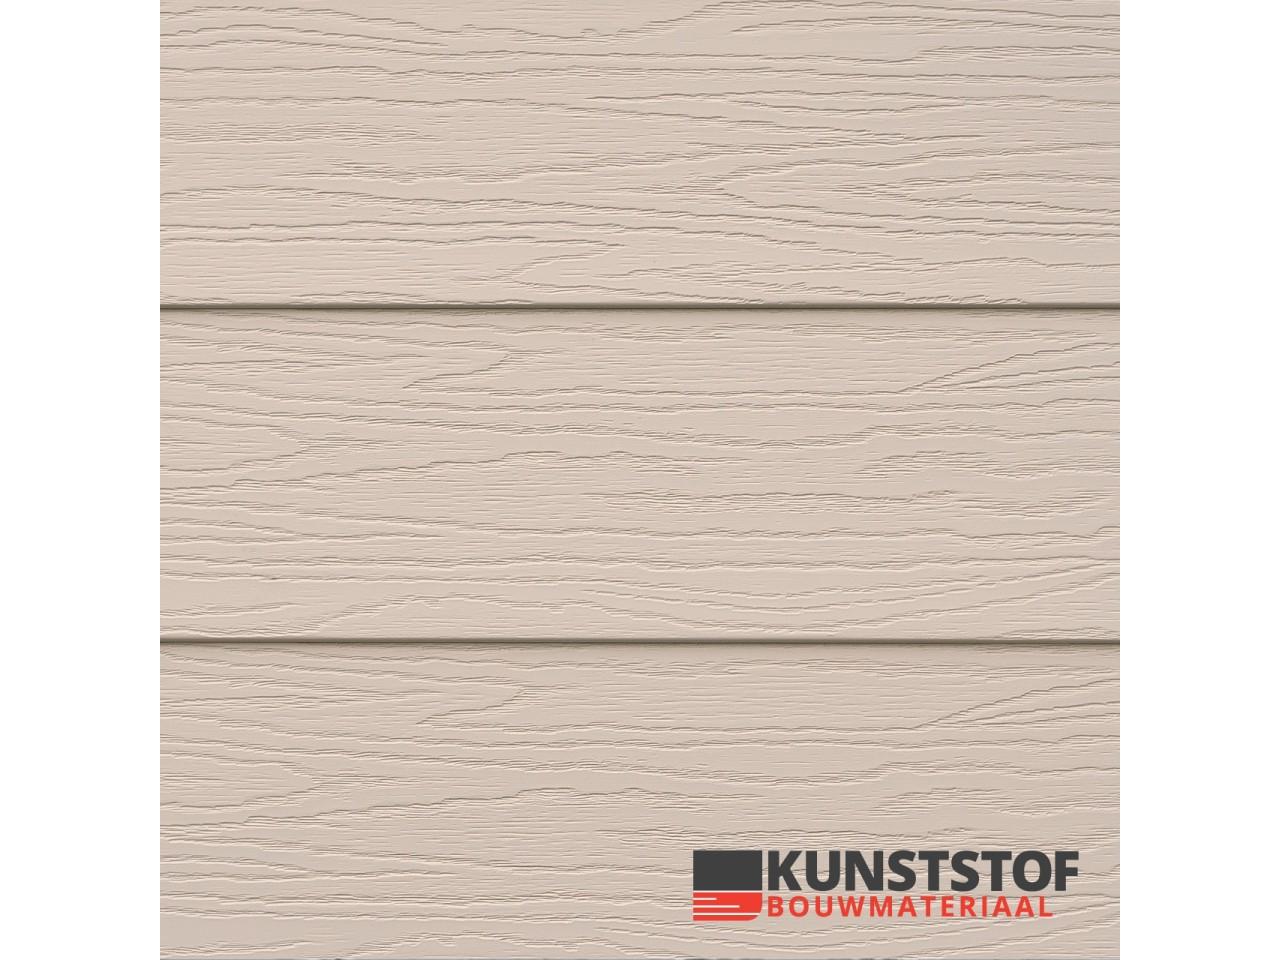 Eurotexx Potdeksel klei - kleur klei - gevelbekleding- Zweeds rabat